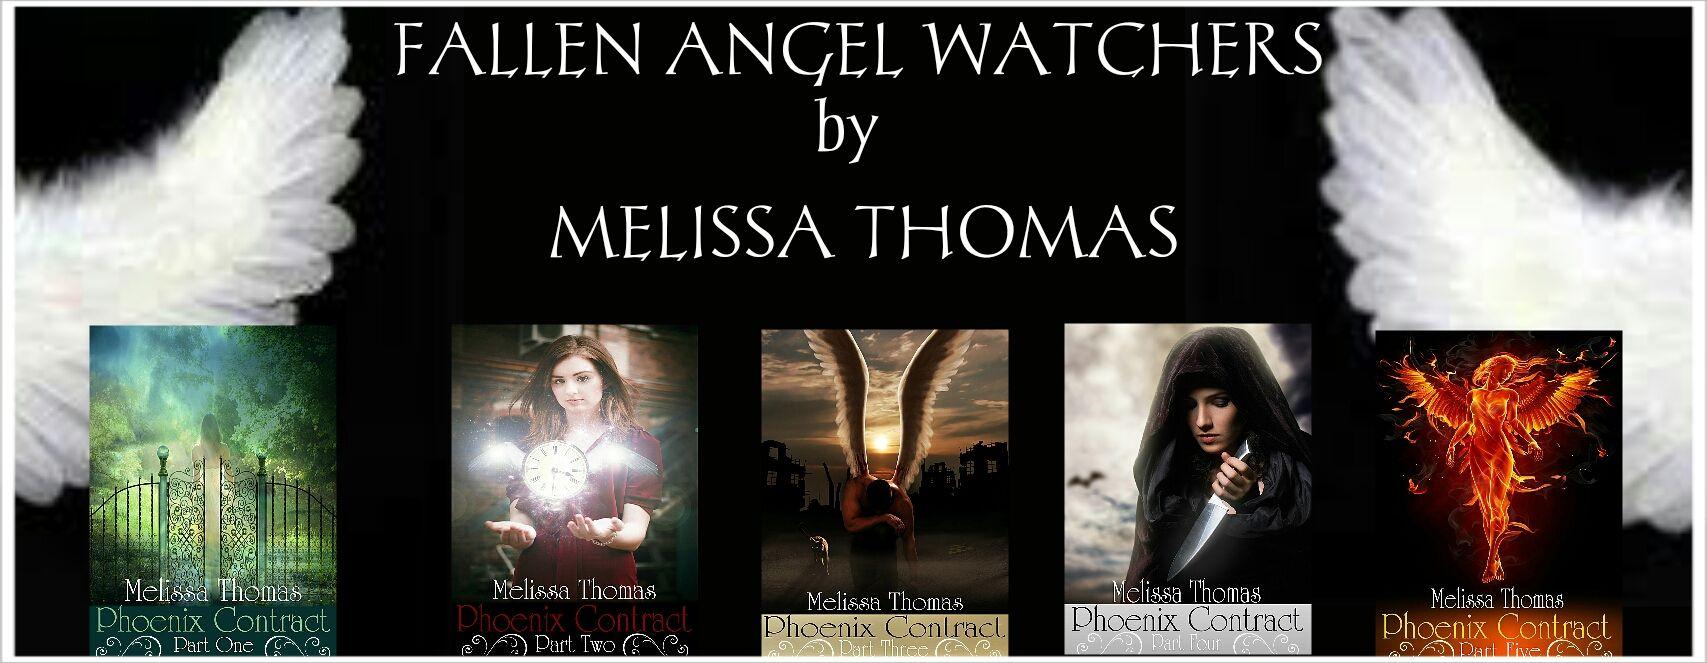 Phoenix Contract Books 1-5 by Mellisa Thomas  Win a $20 Amazon/BN GC https://www.rafflecopter.com/rafl/display/28e4345f1223/